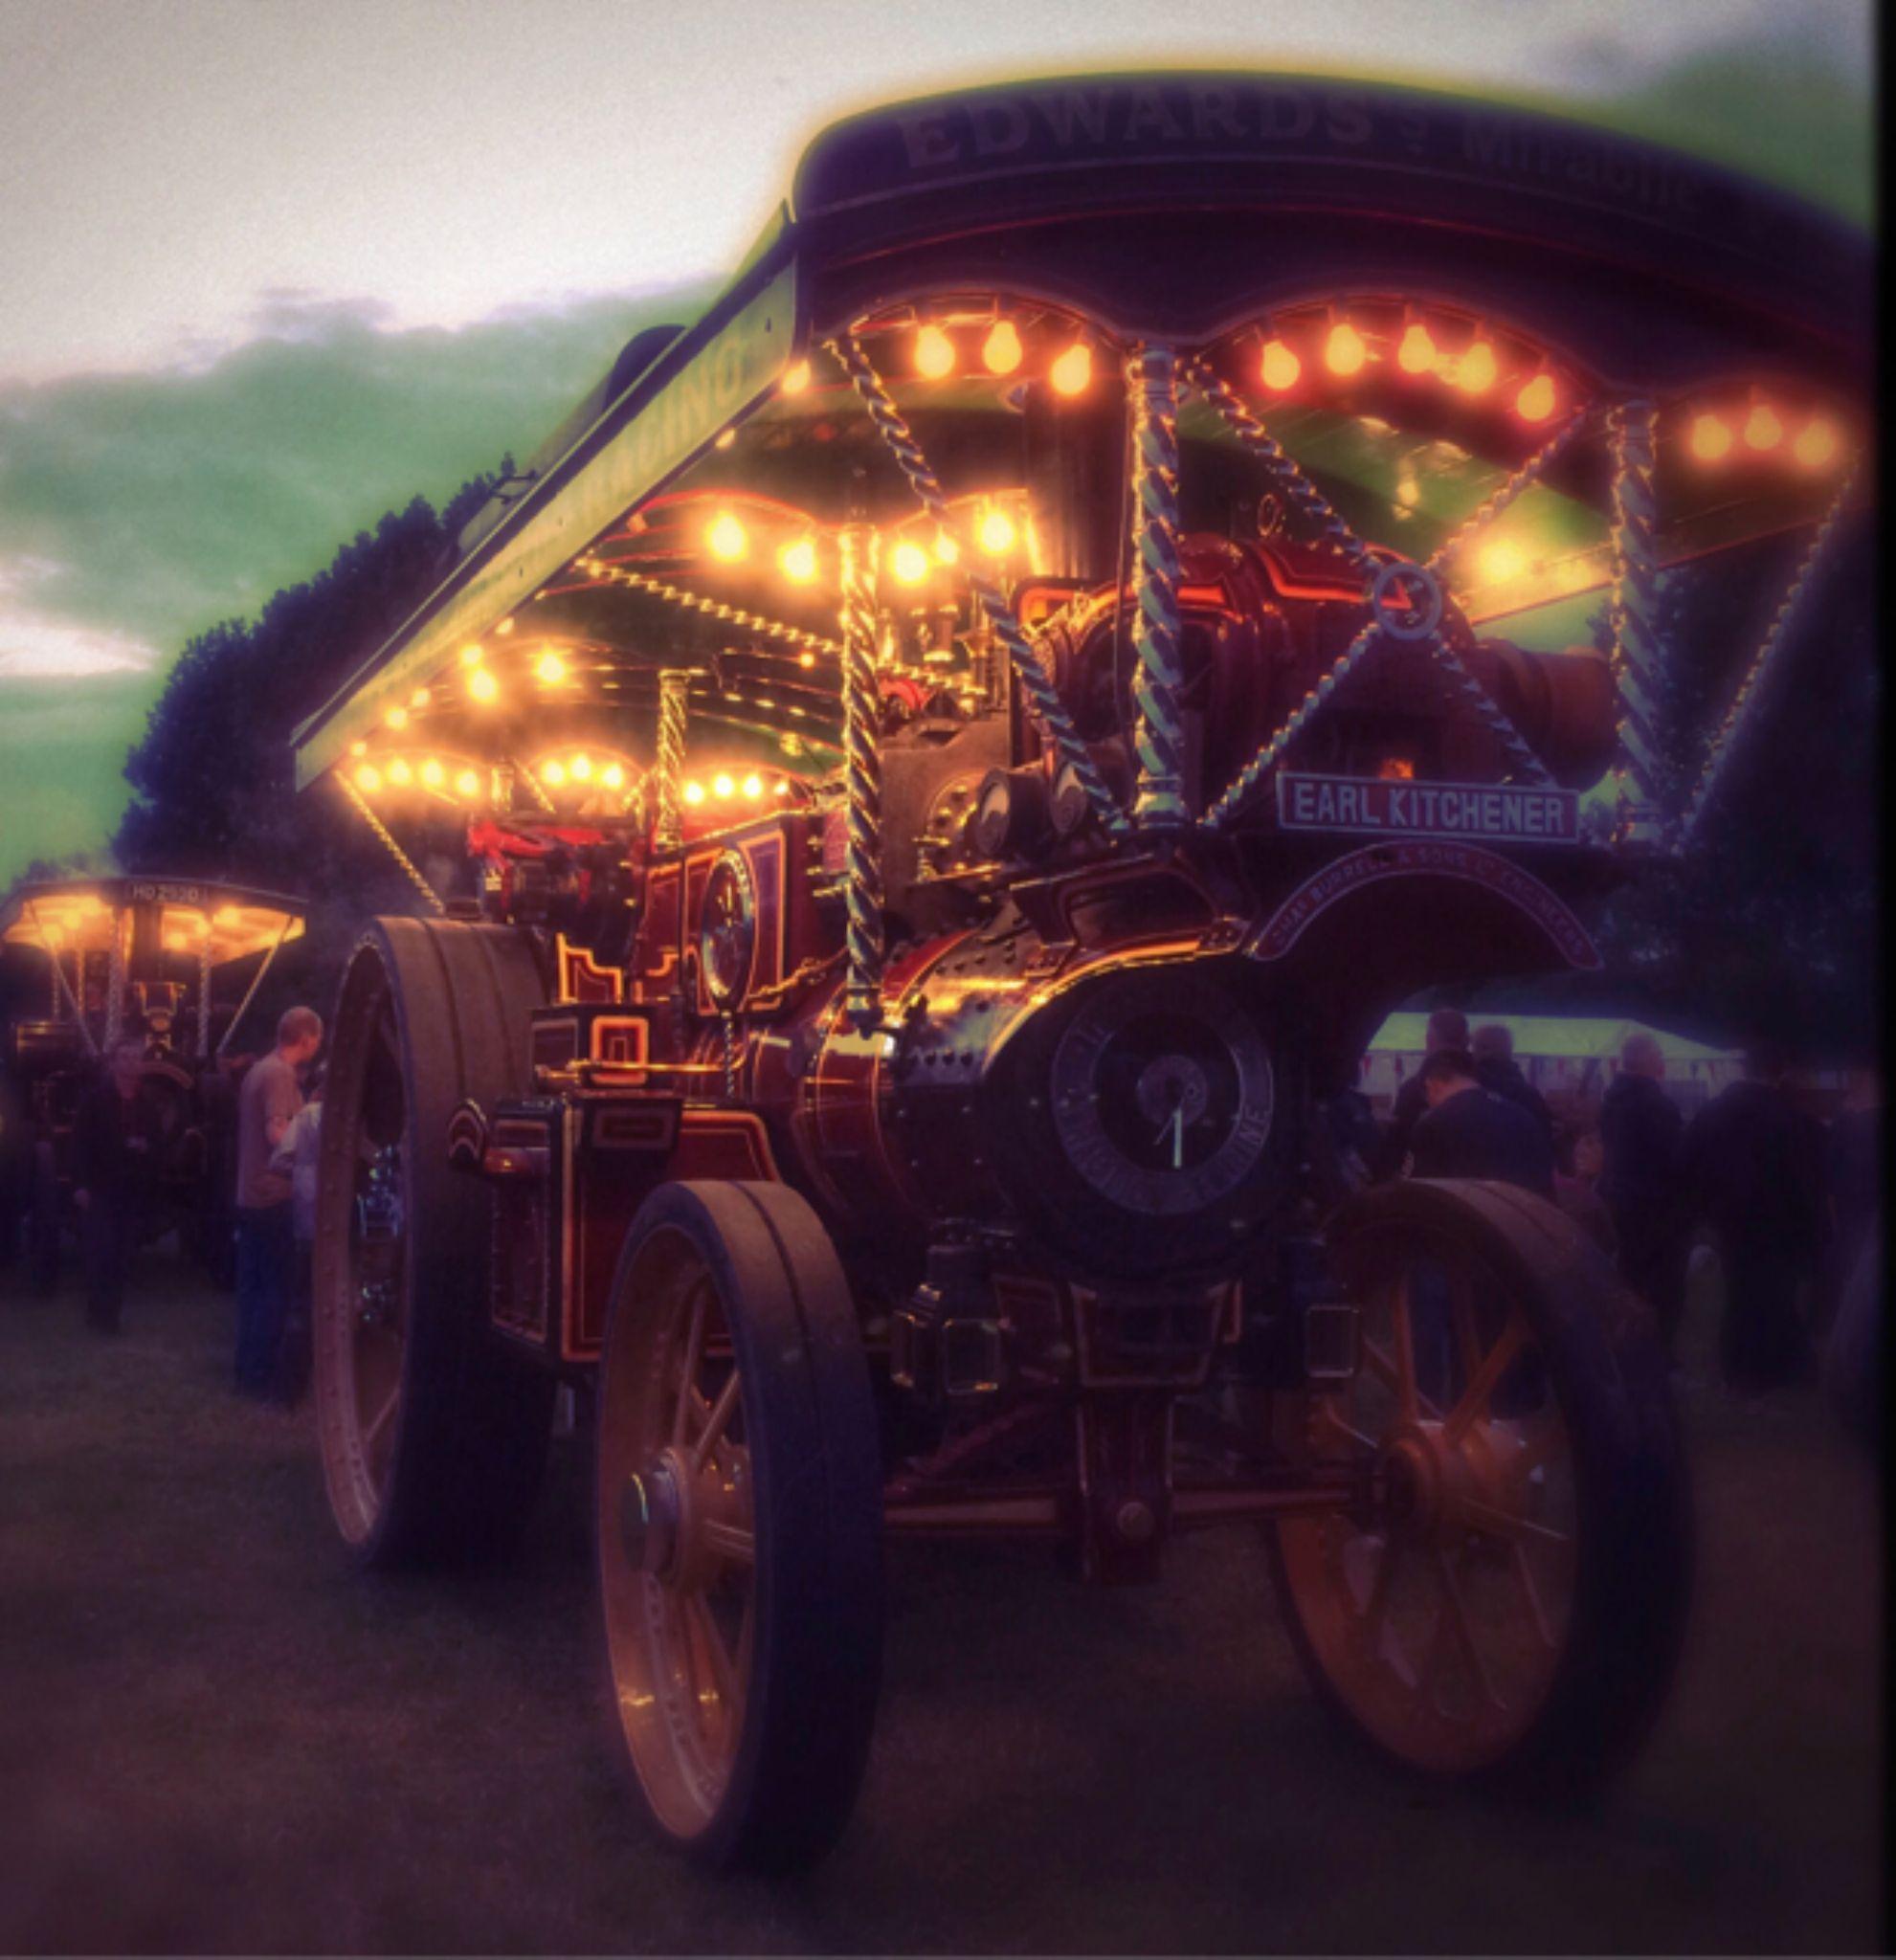 steam at night by GillianFG